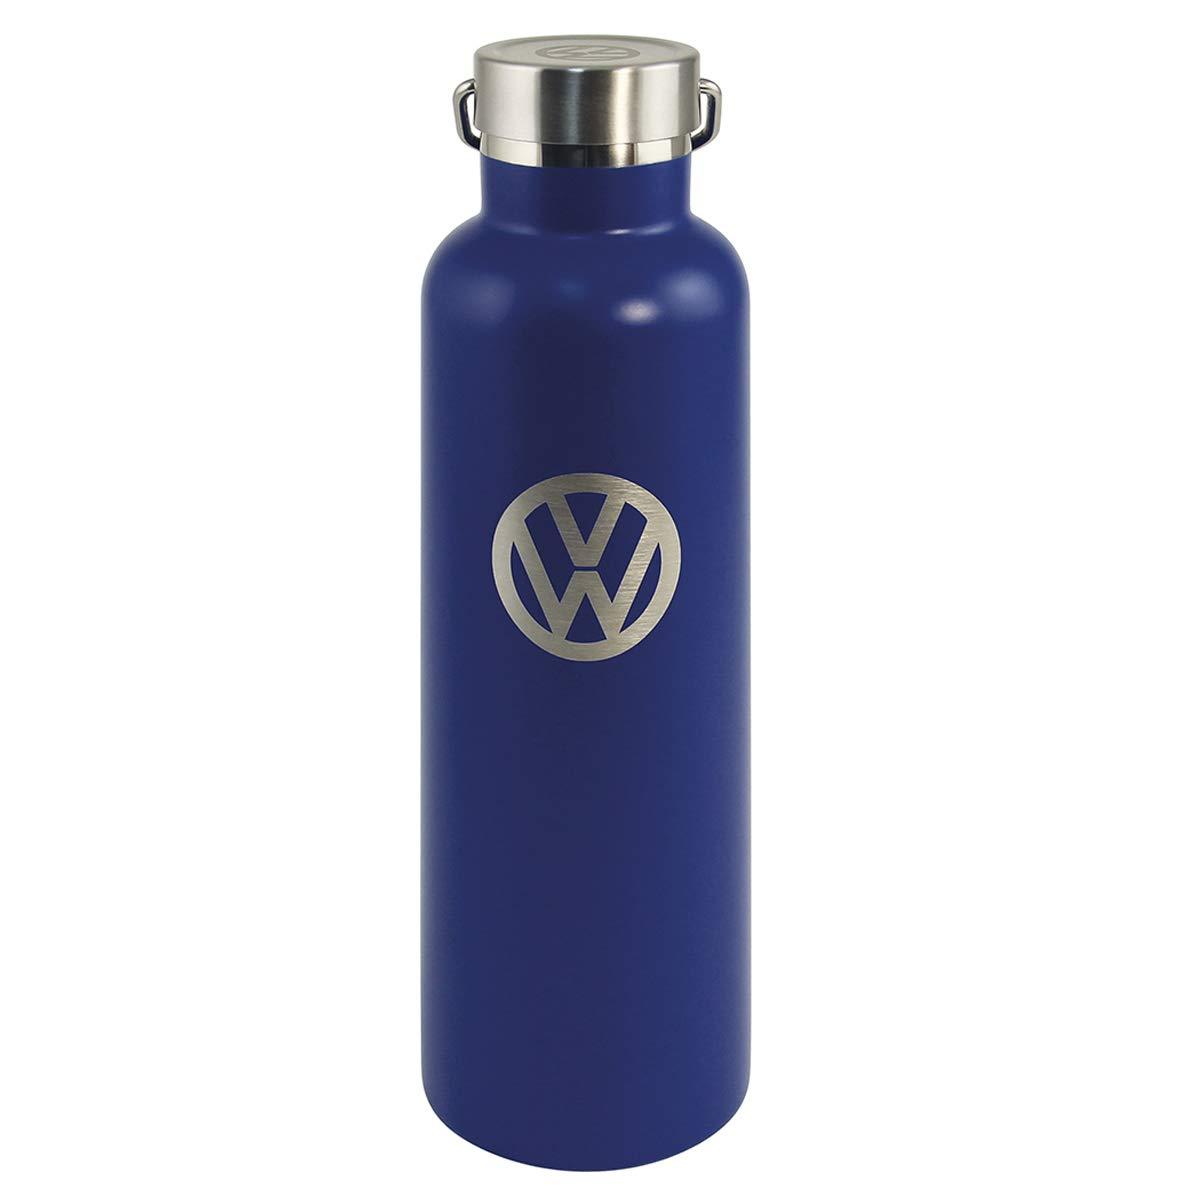 Volkswagen [Q1991] - Design Isothermal Bottle 'Volkswagen' Blue Gray Vintage - 25x7 cm (9.84''x2.76'') (73.5 cl).